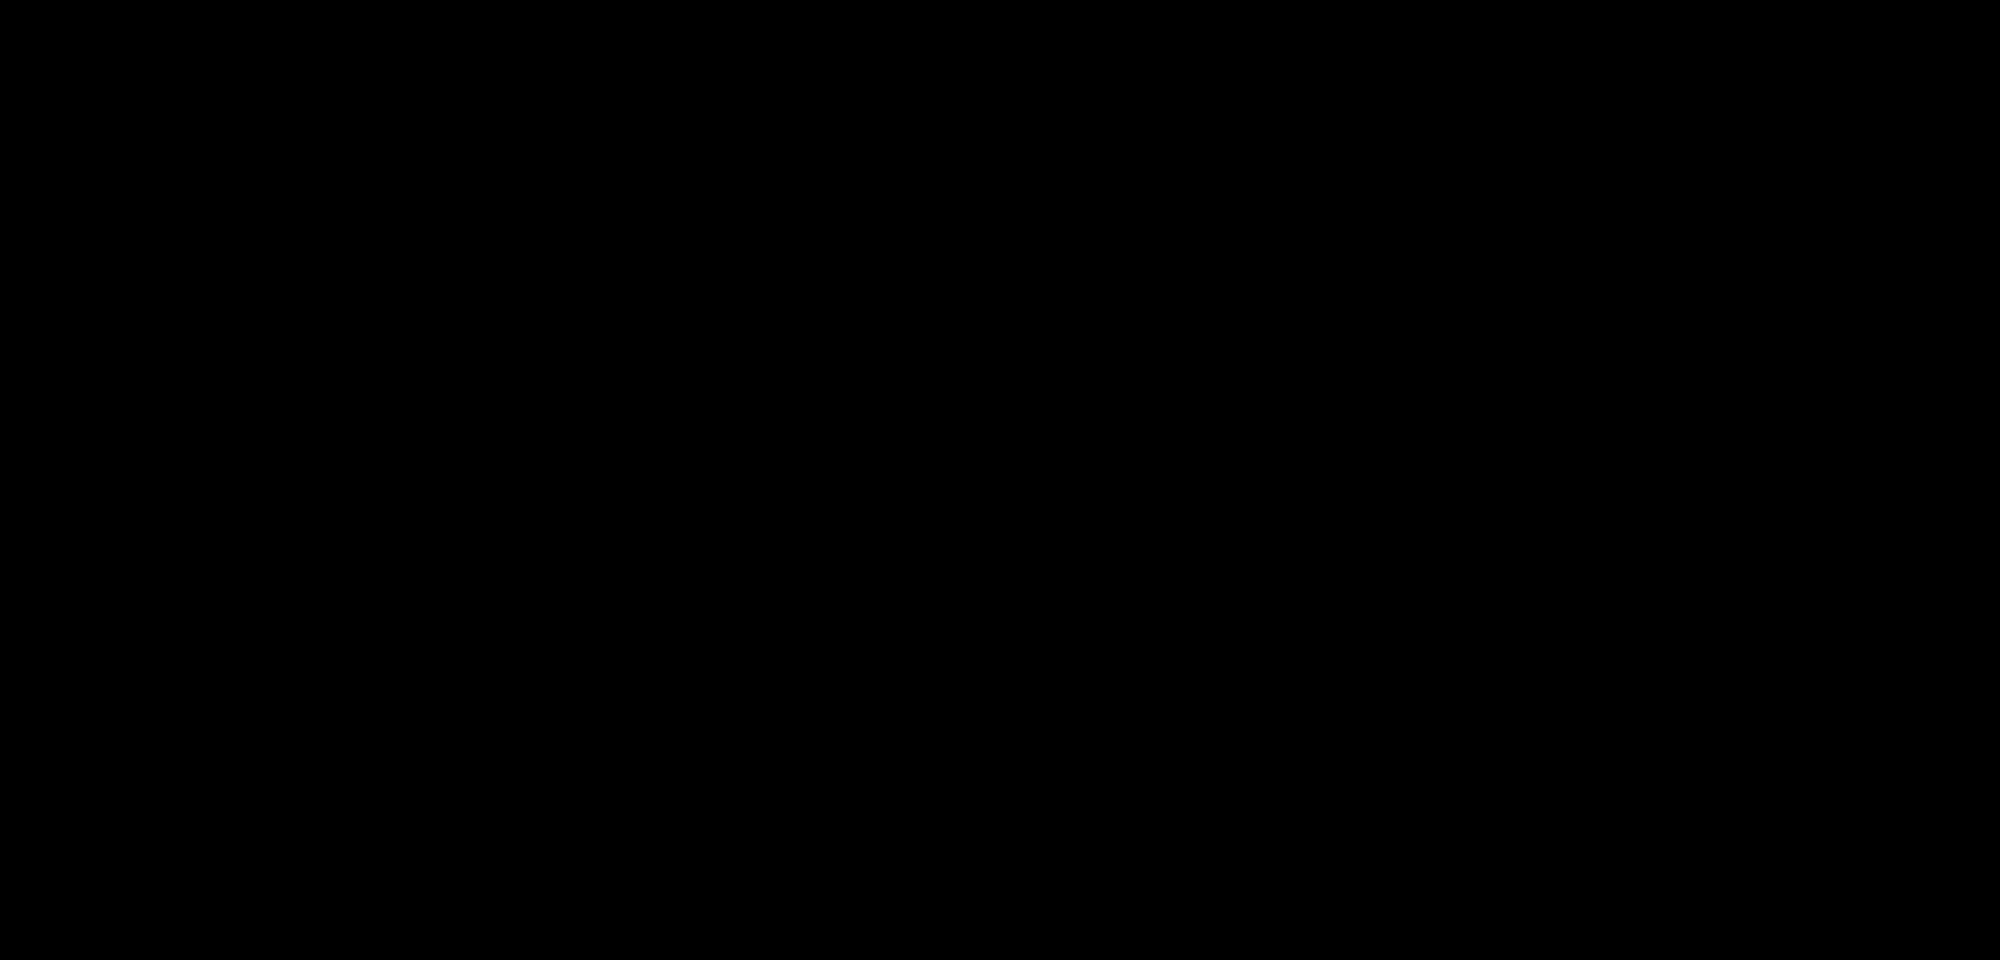 aca_001